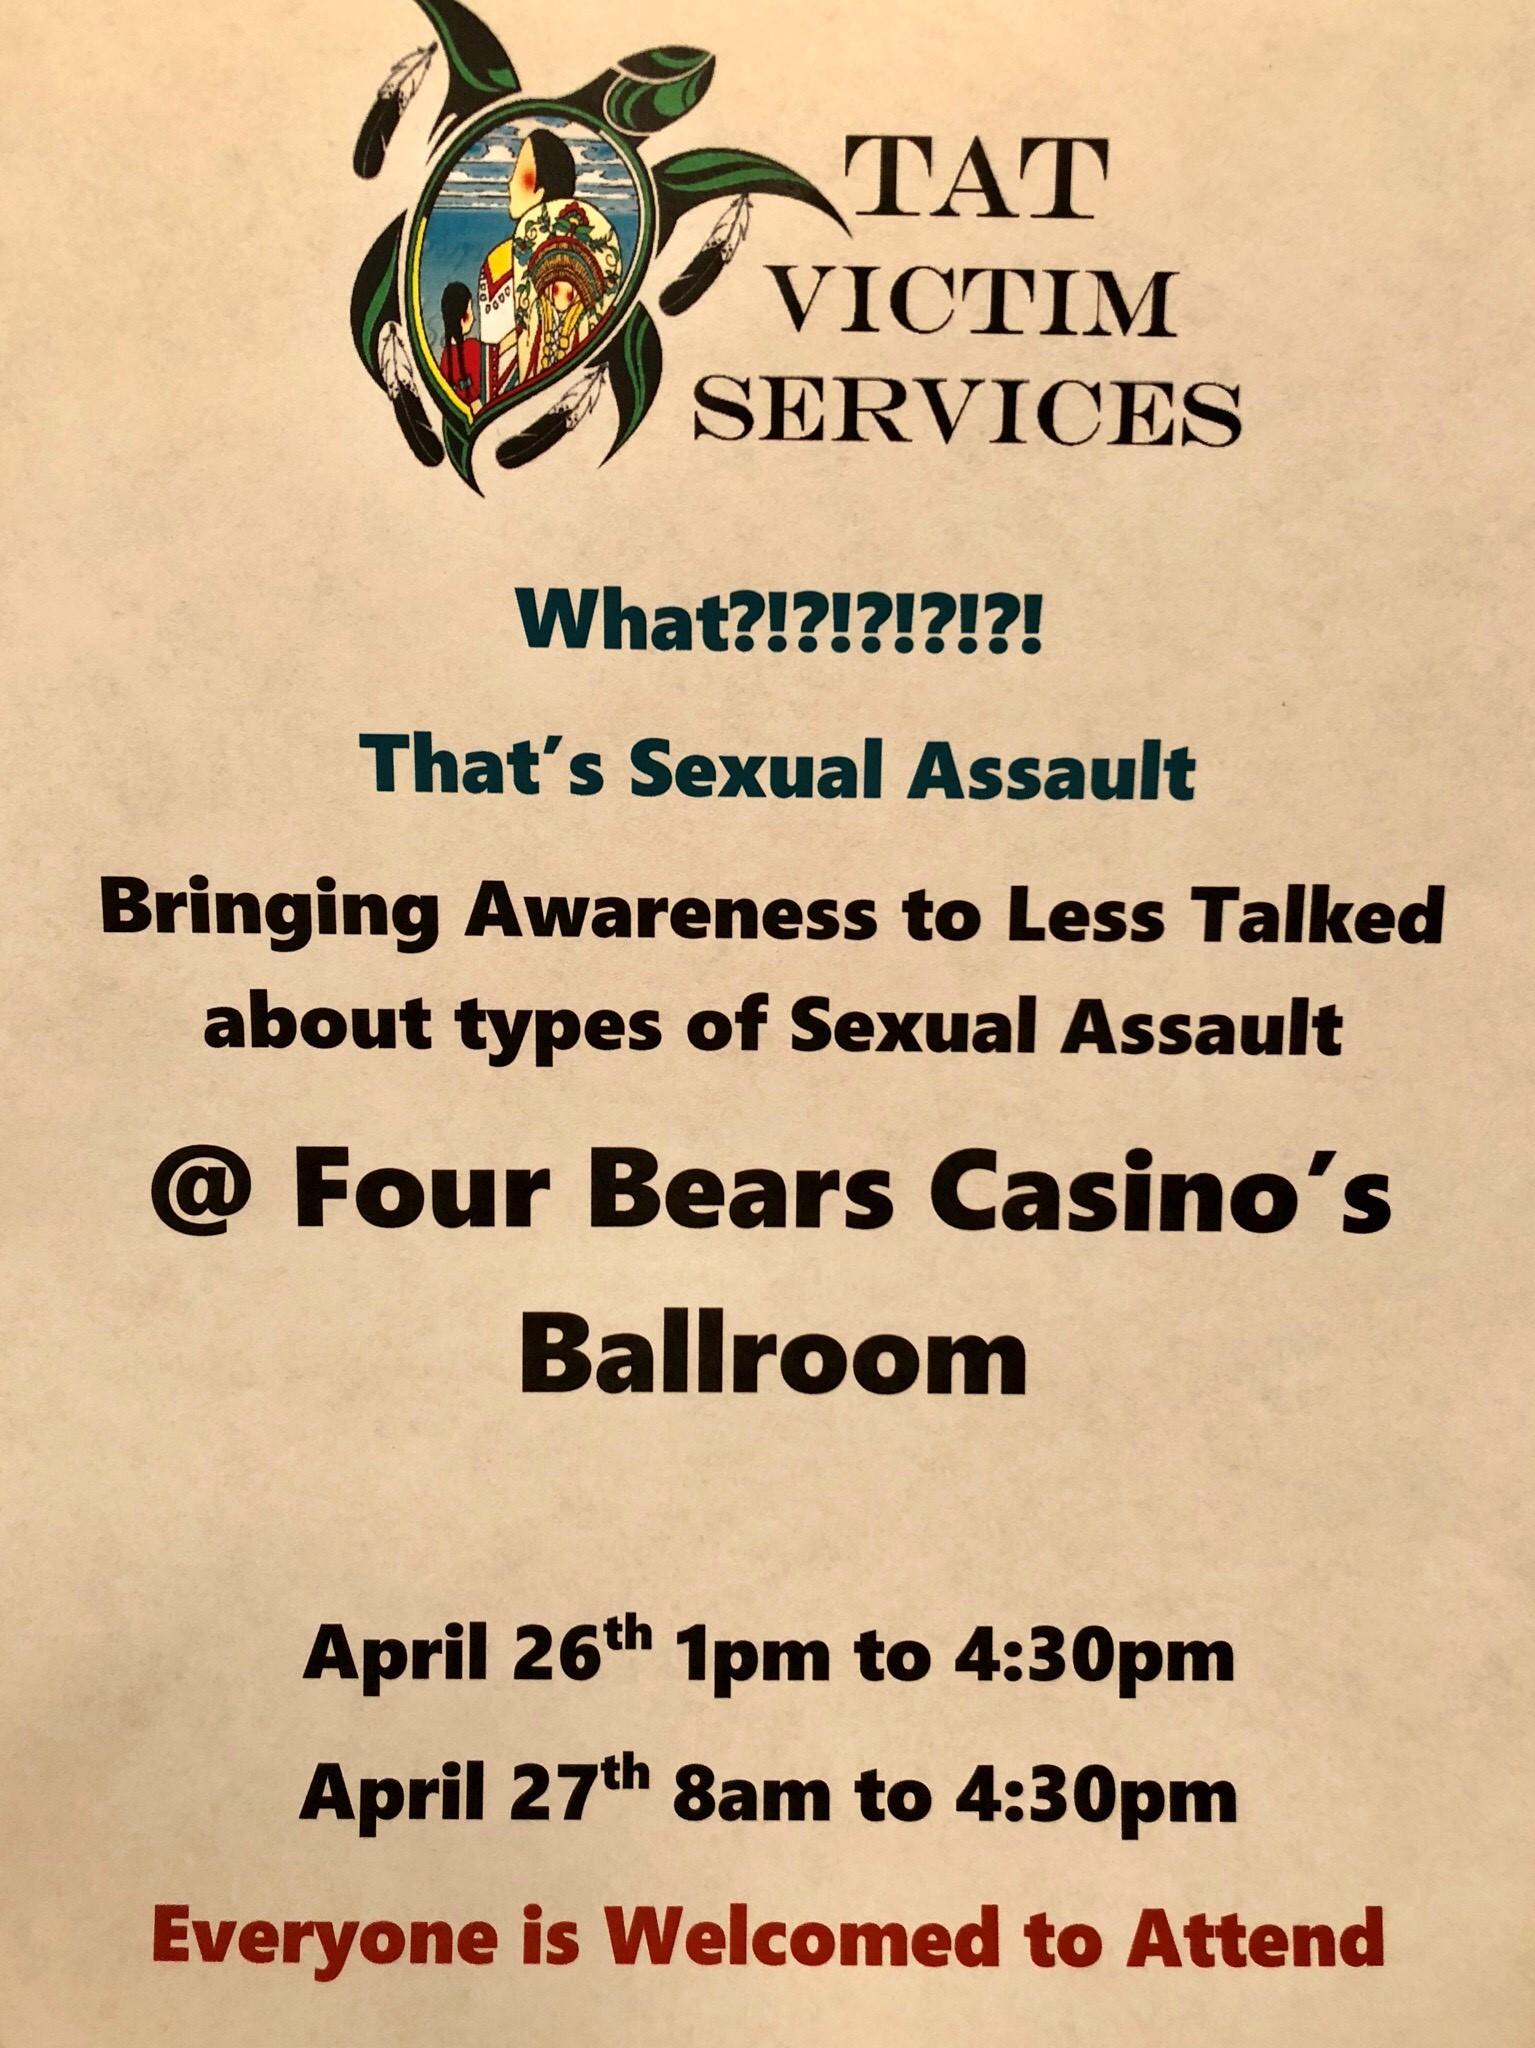 TAT Domestic Violence Sexual Assault Conference April 26-27.jpg